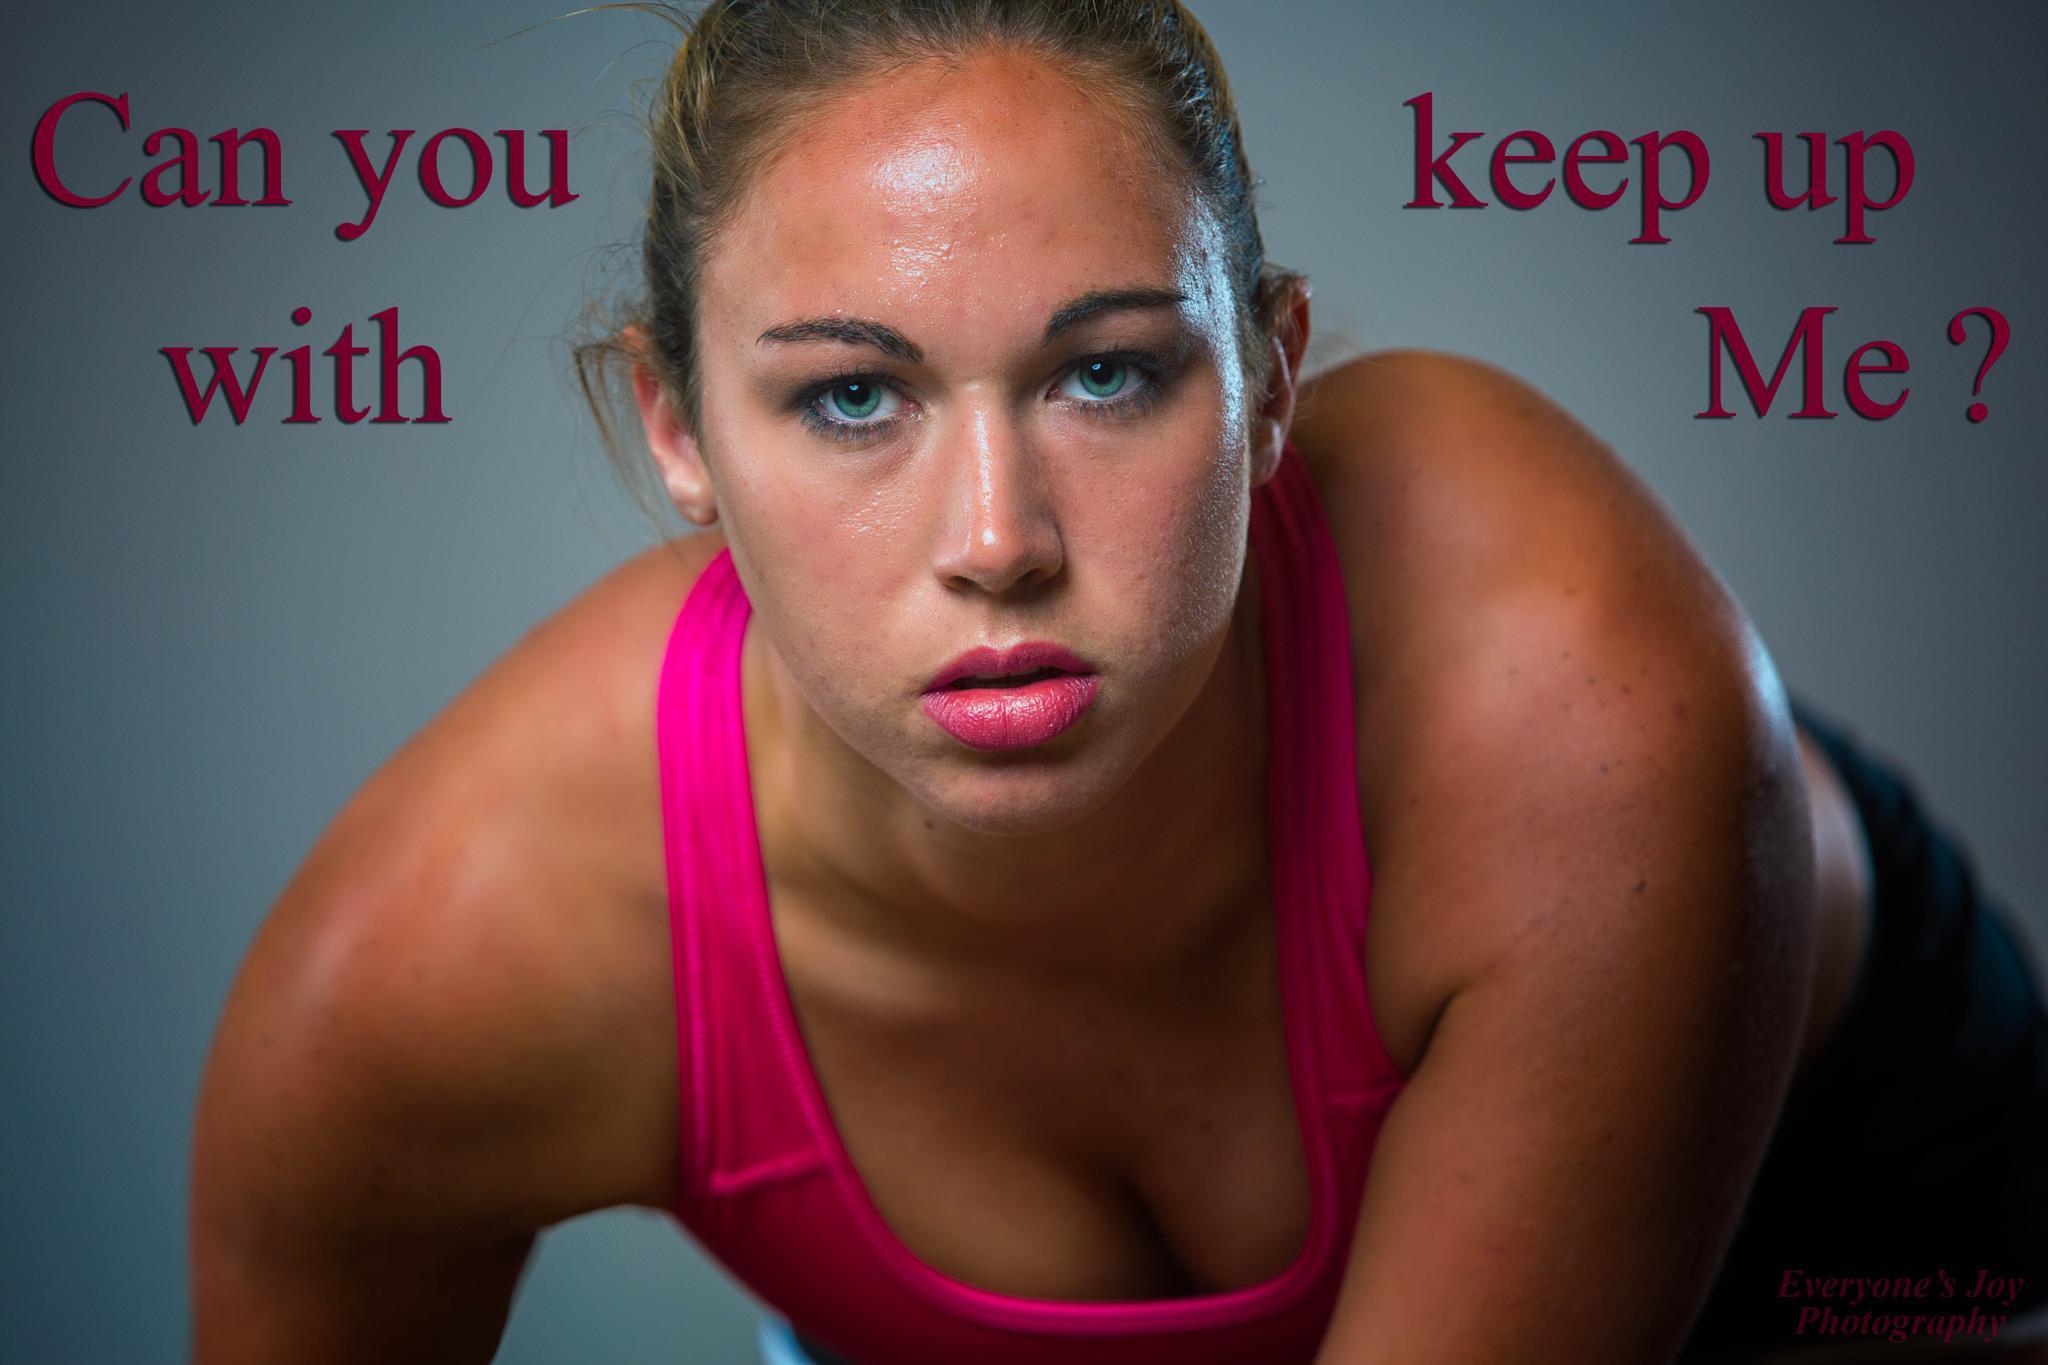 Fitness poster by Joseph Harrison